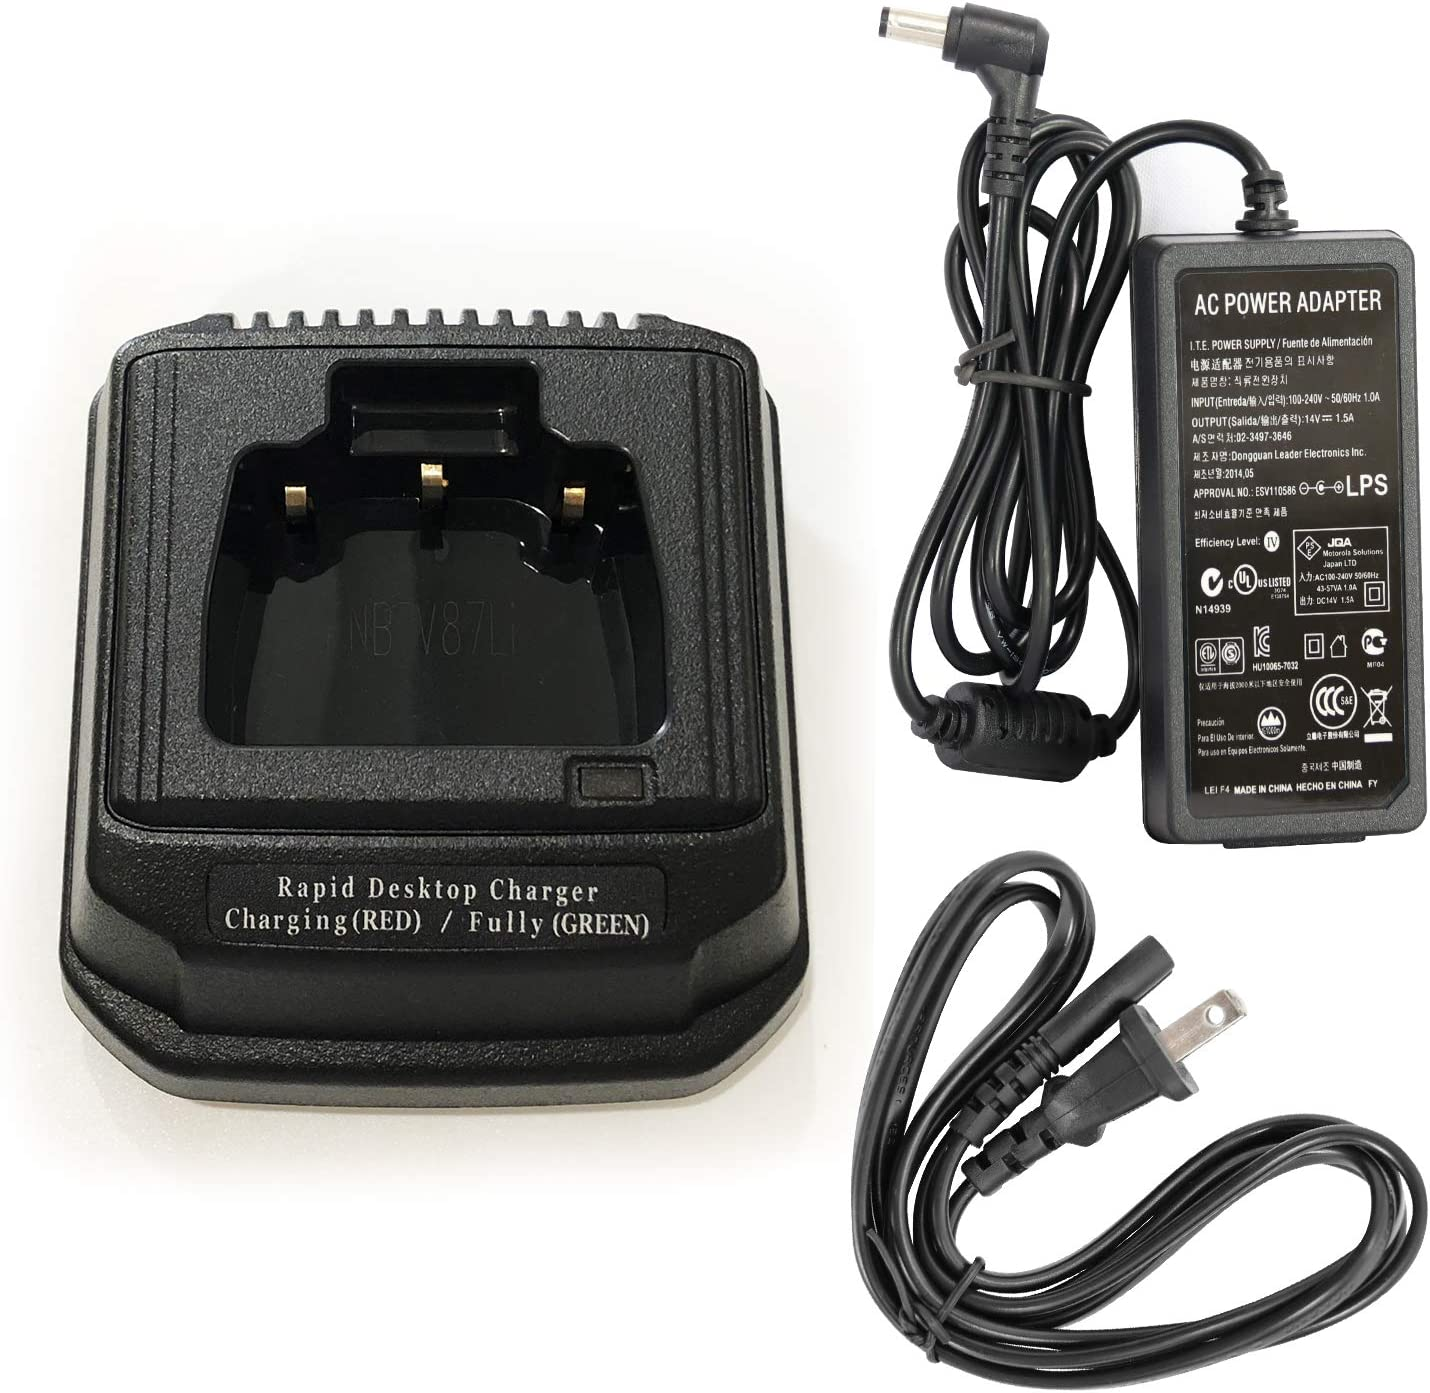 VAC-920 Rapid Charger for Vertex VX821 VX829 VXP821 VXP824 VXP829 Radio